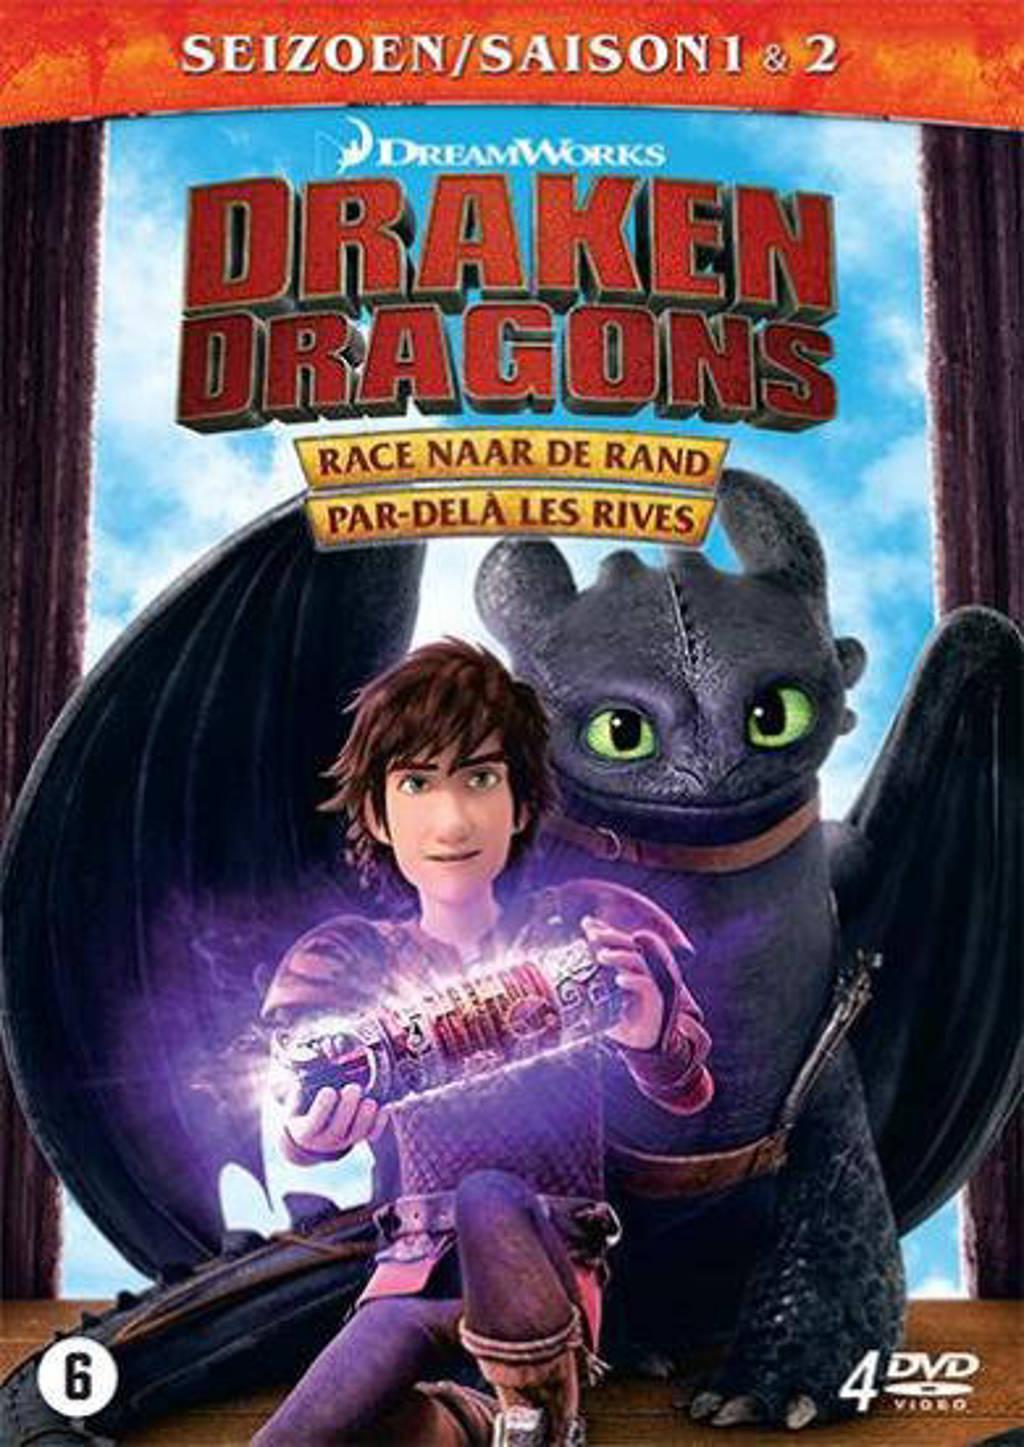 Draken race naar de rand - Seizoen 1-2 (DVD)